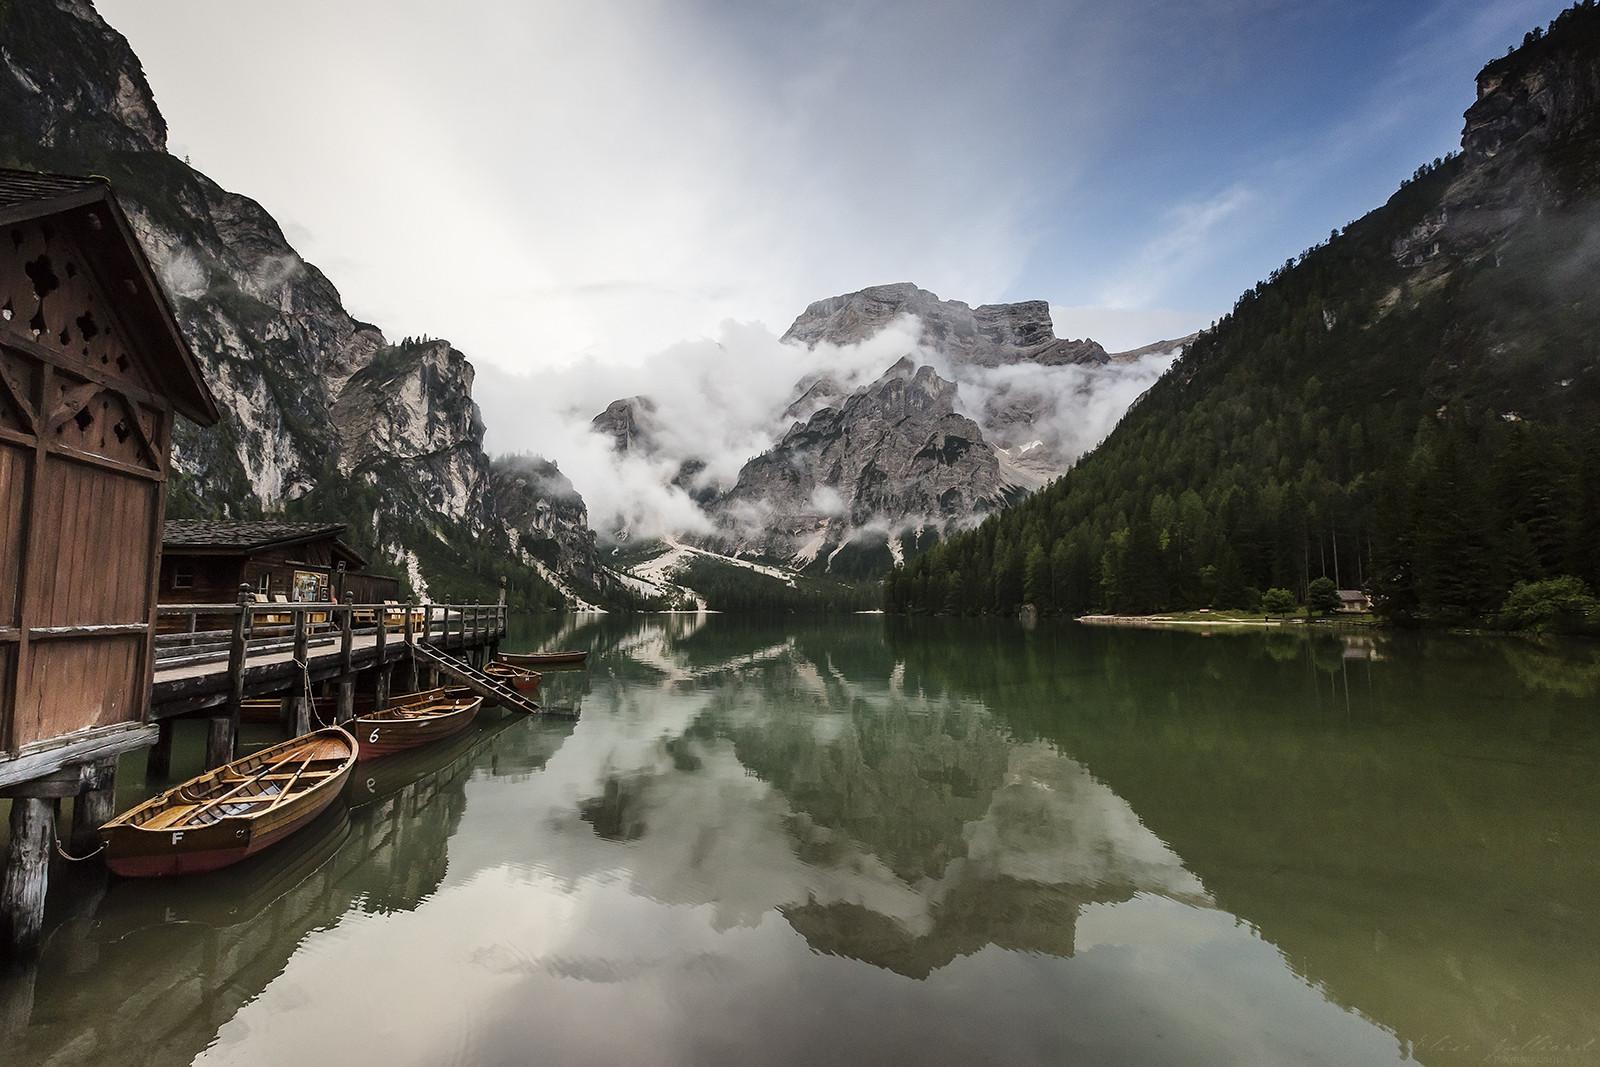 elise-julliard-photographe-lyon-france-rhone-alpes-photo-paysage-montagne-dolomites-italie-lago-di-braies